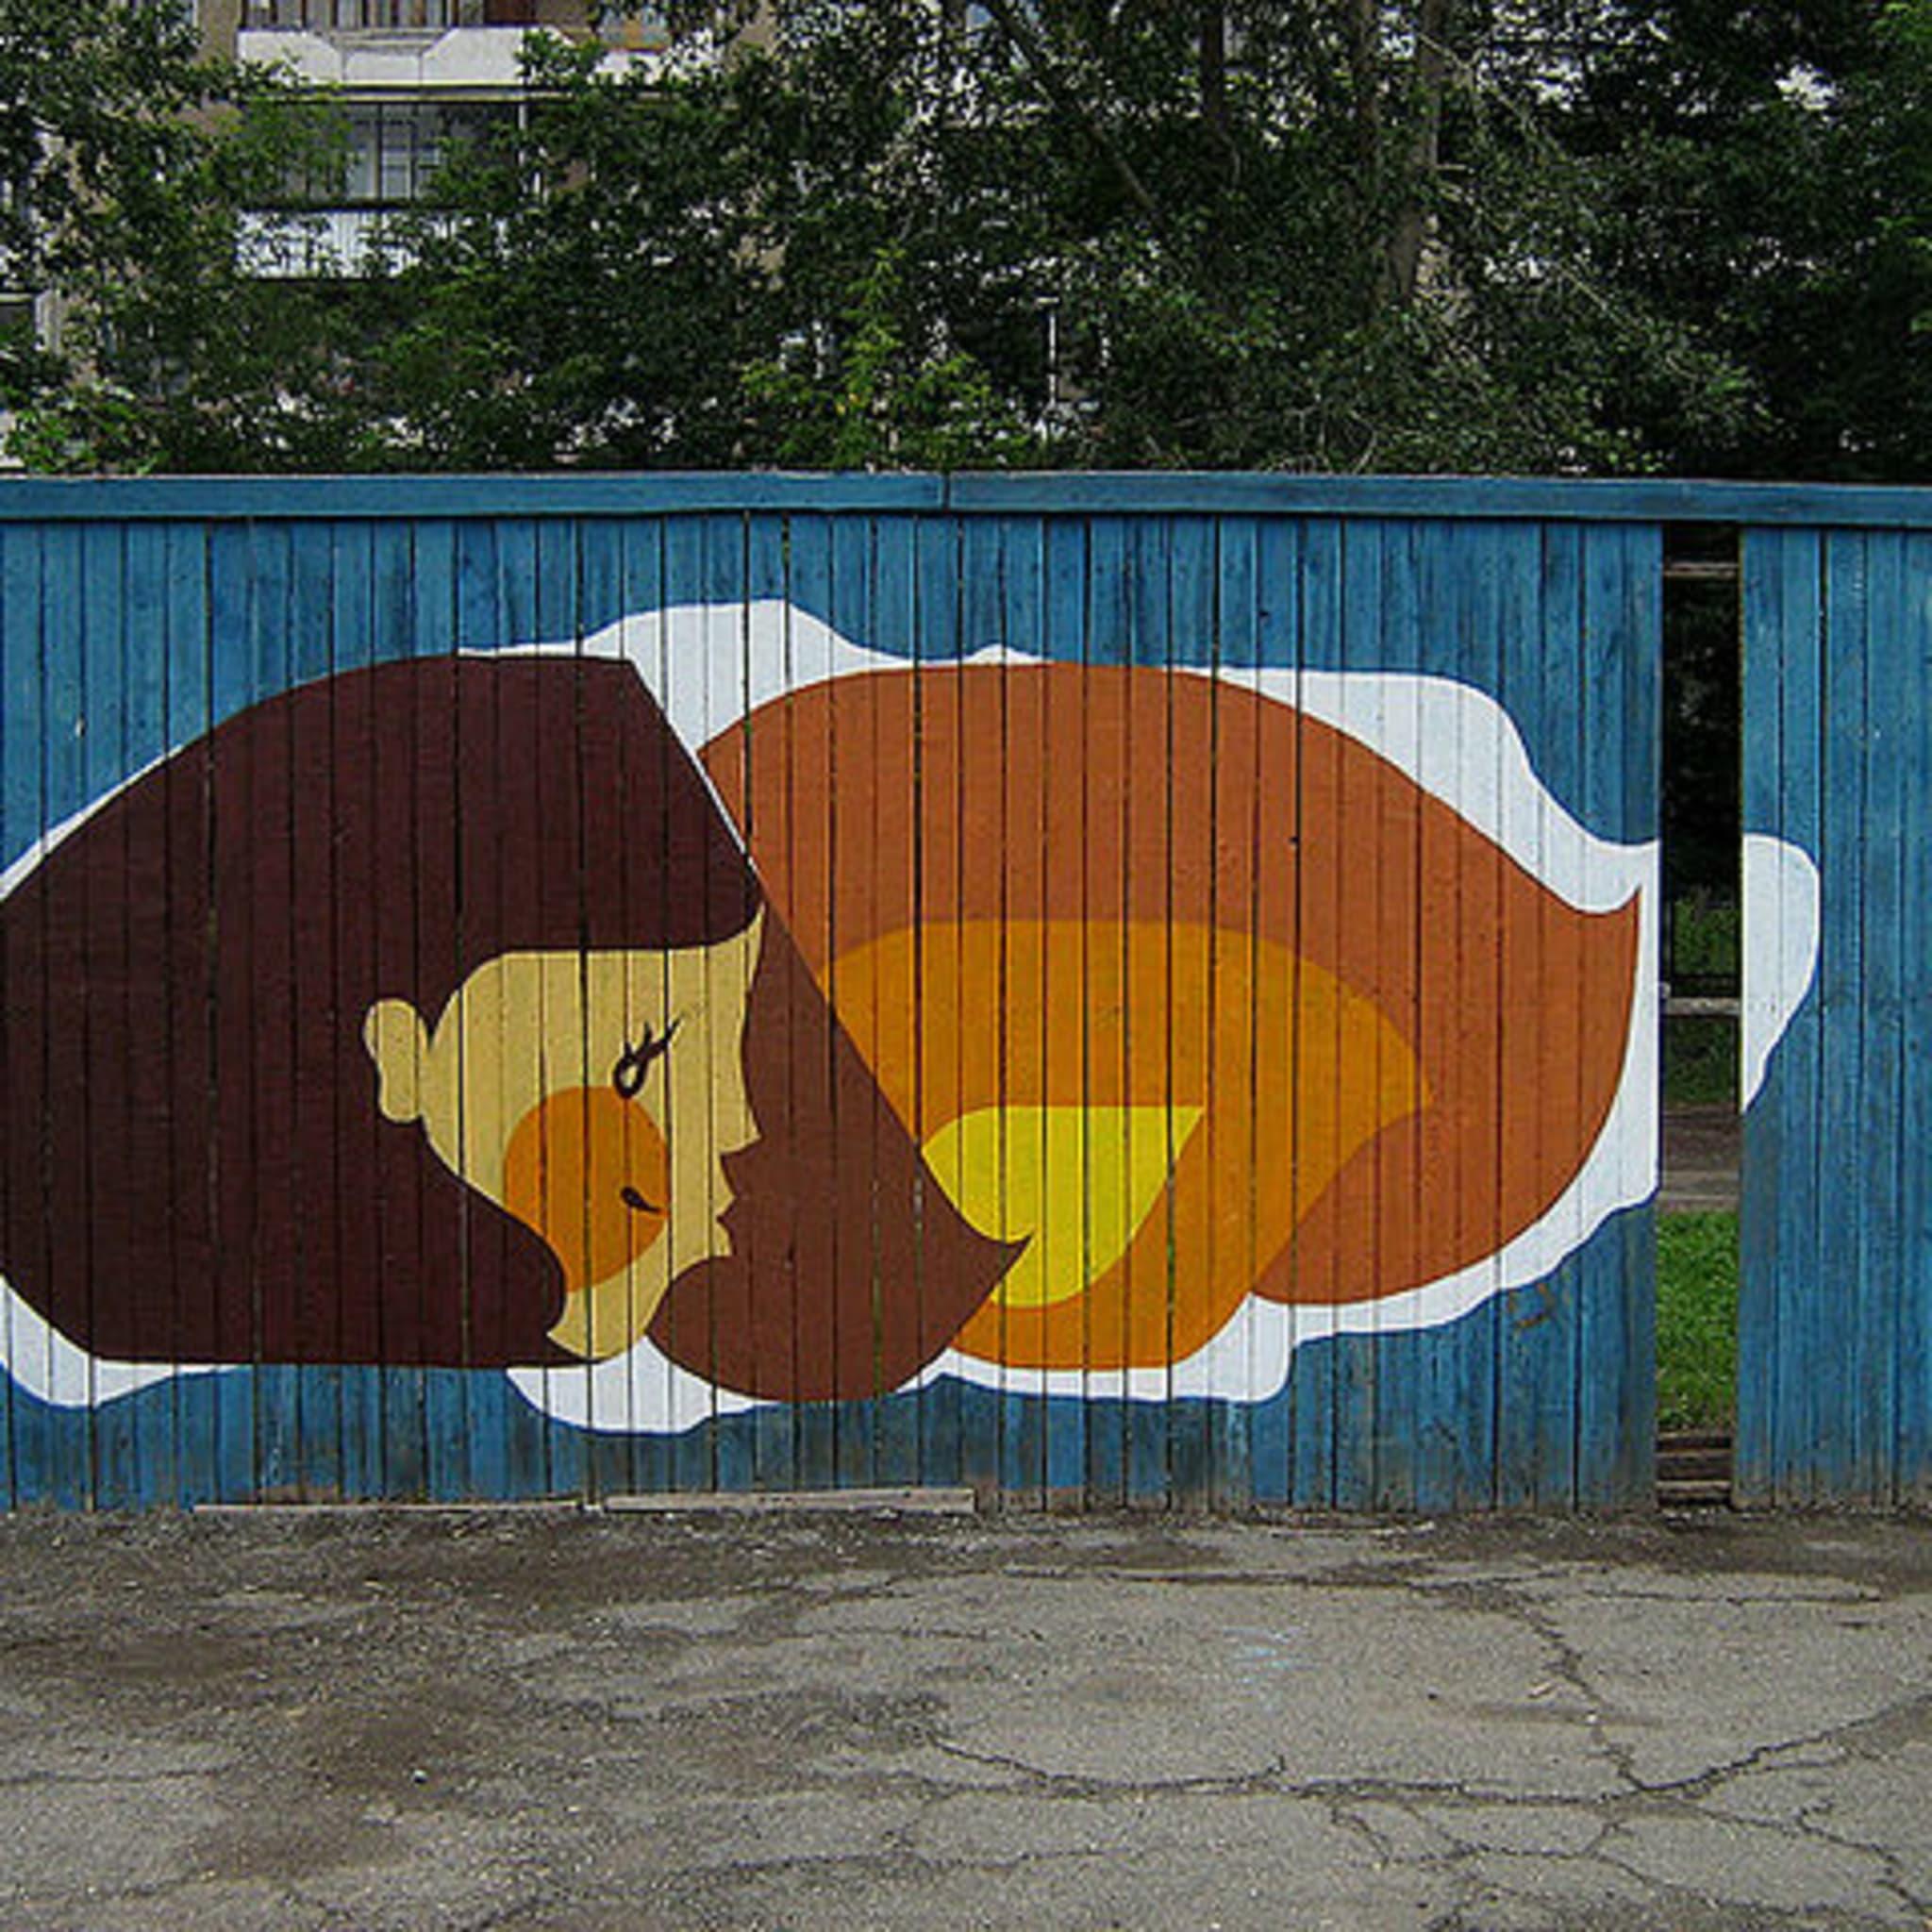 Evgeny Dikson